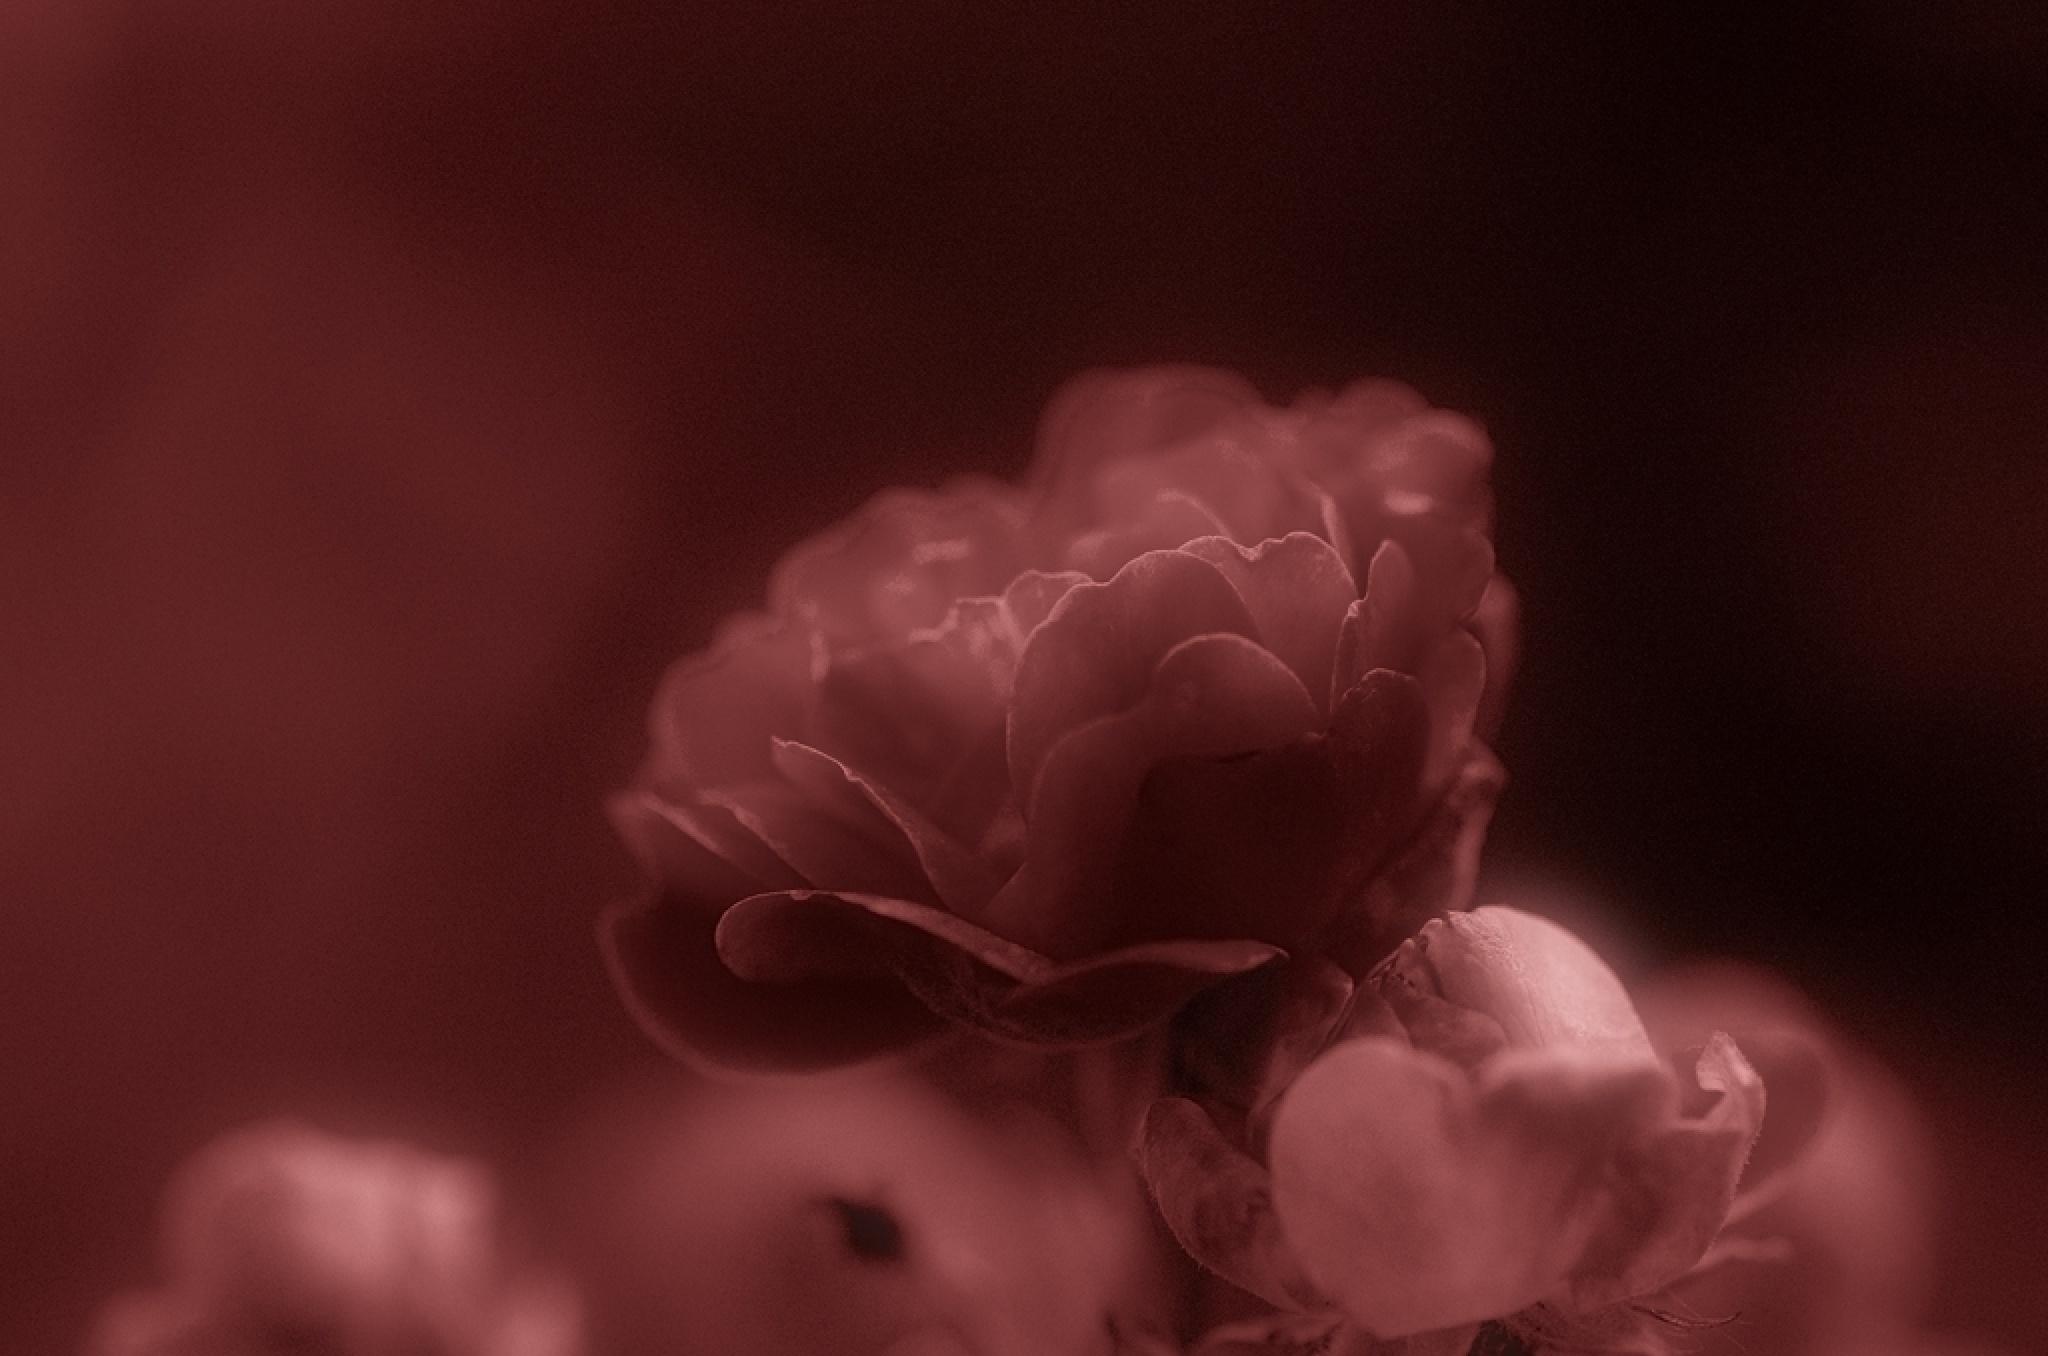 Rose by Captainmorgan1301